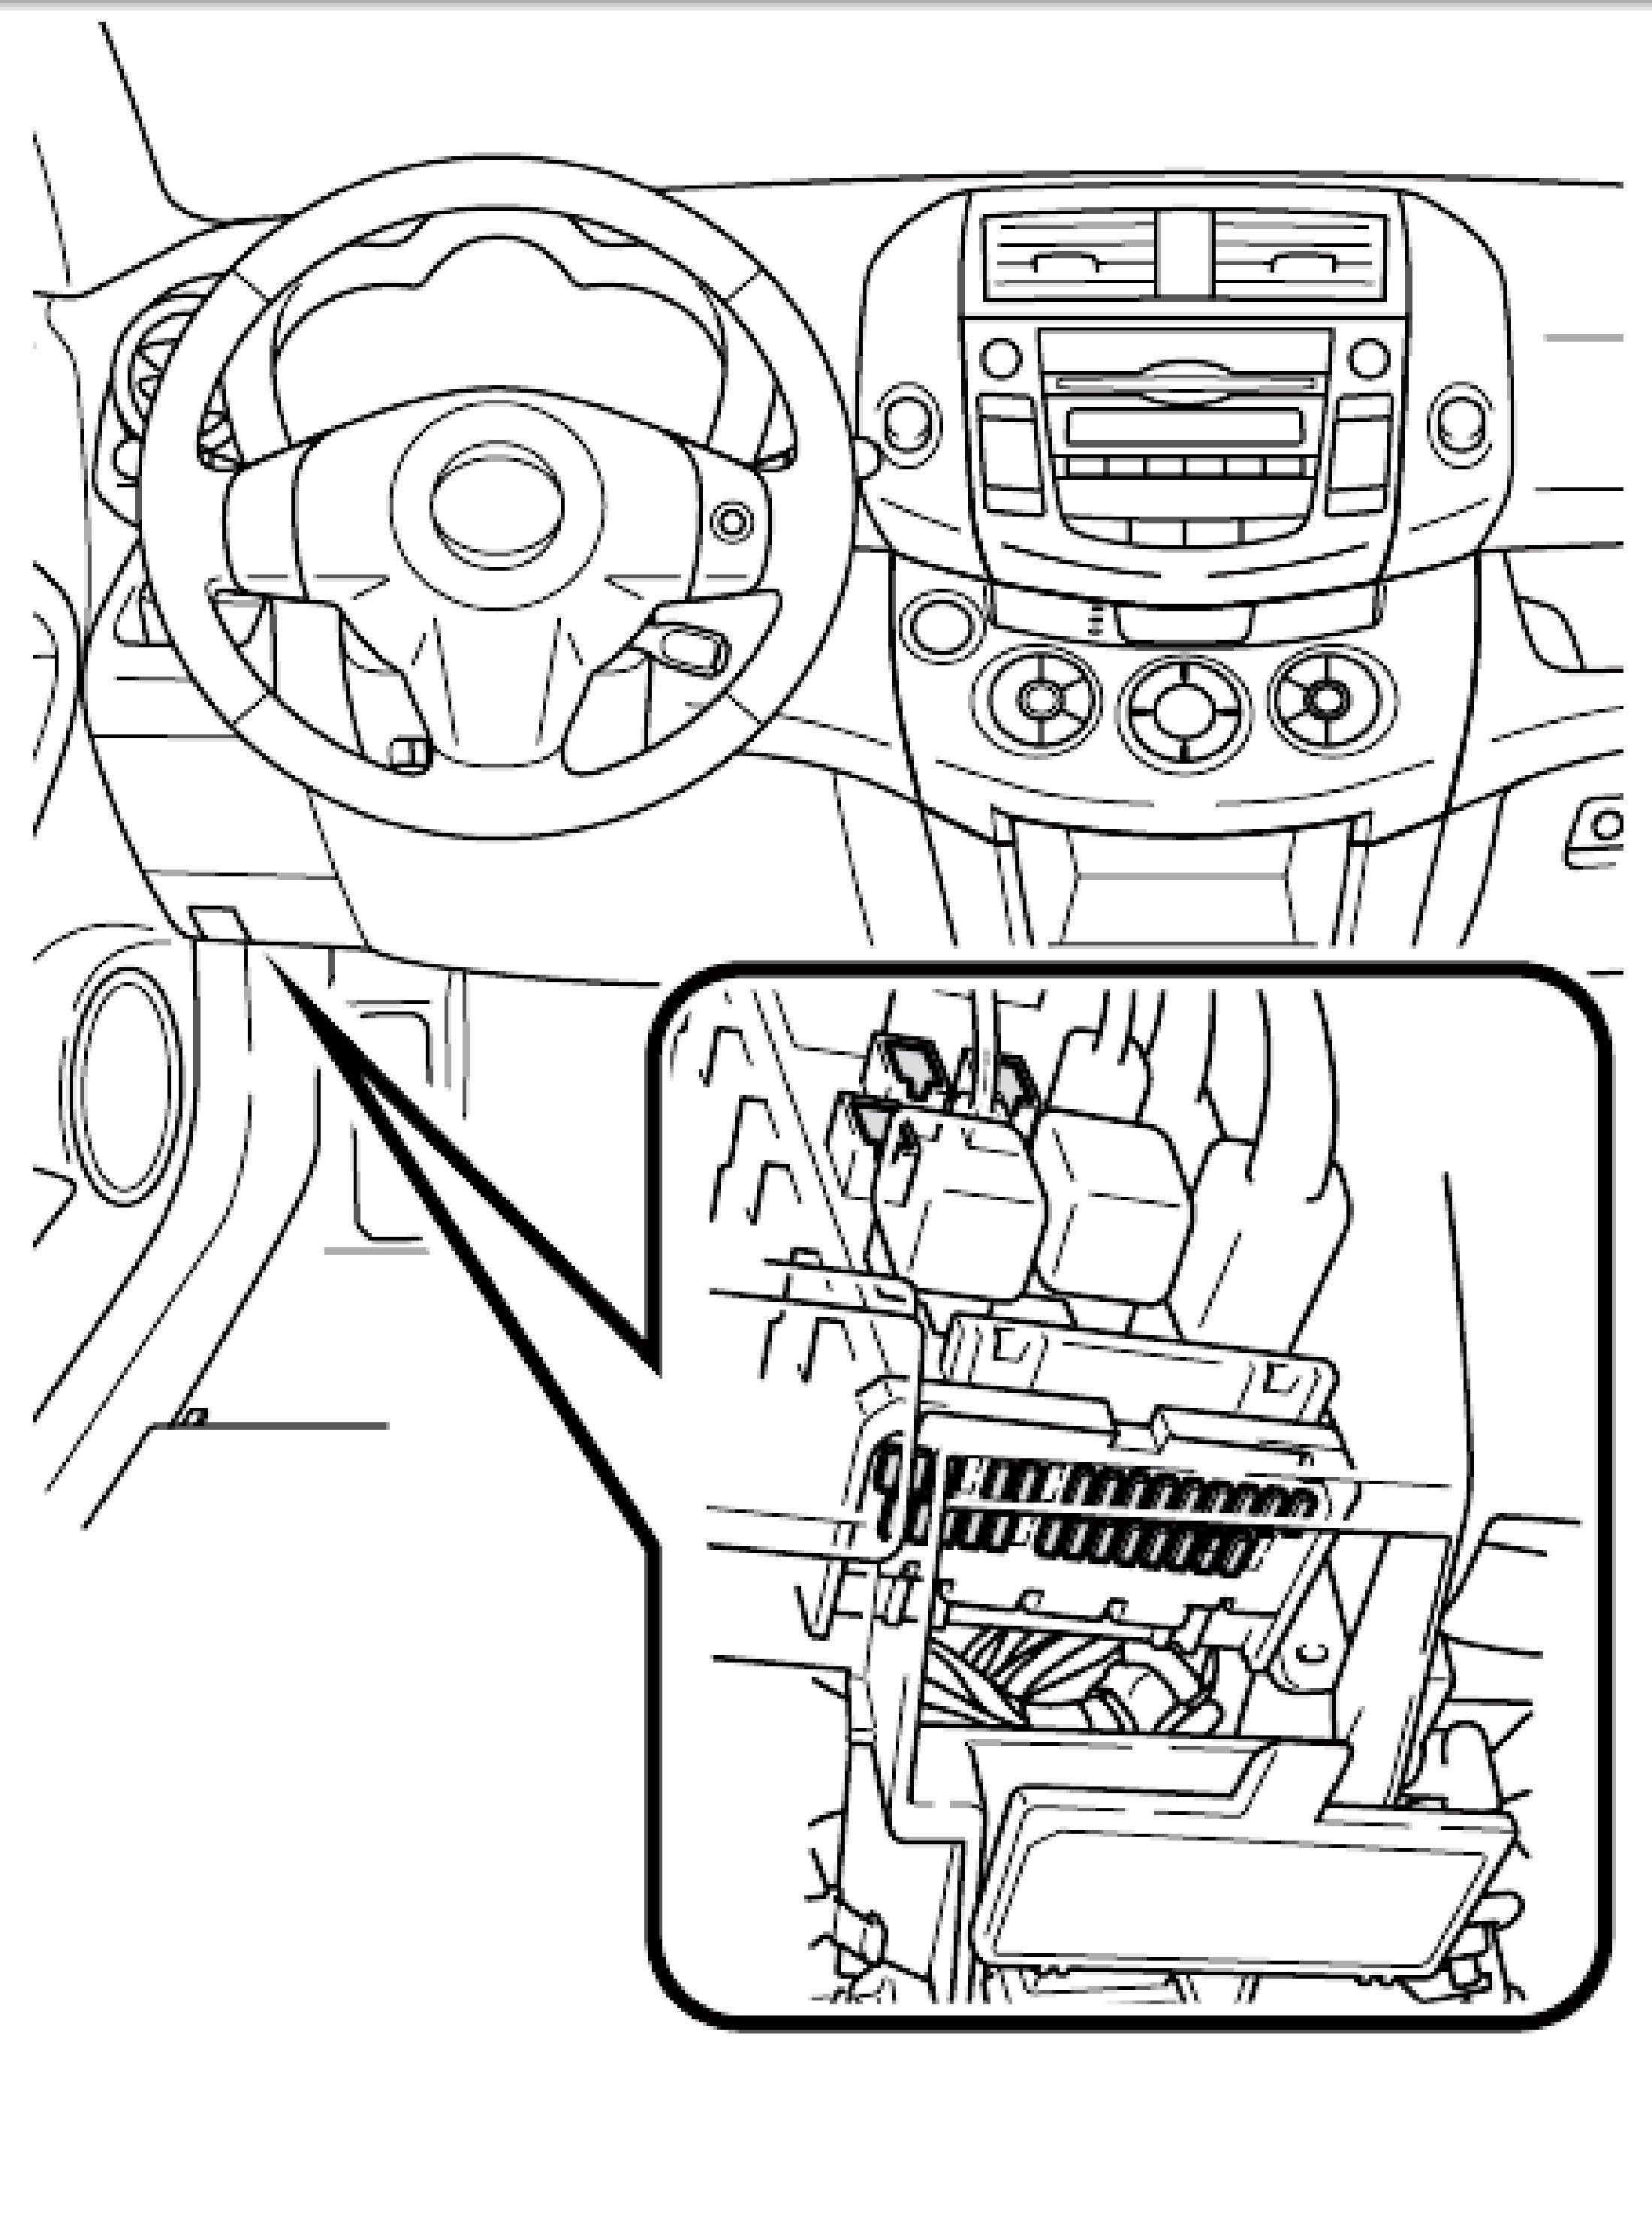 1998 toyota rav4 fuse box toyota wiring diagrams instructions rh free freeautoresponder co 1999 ford ranger